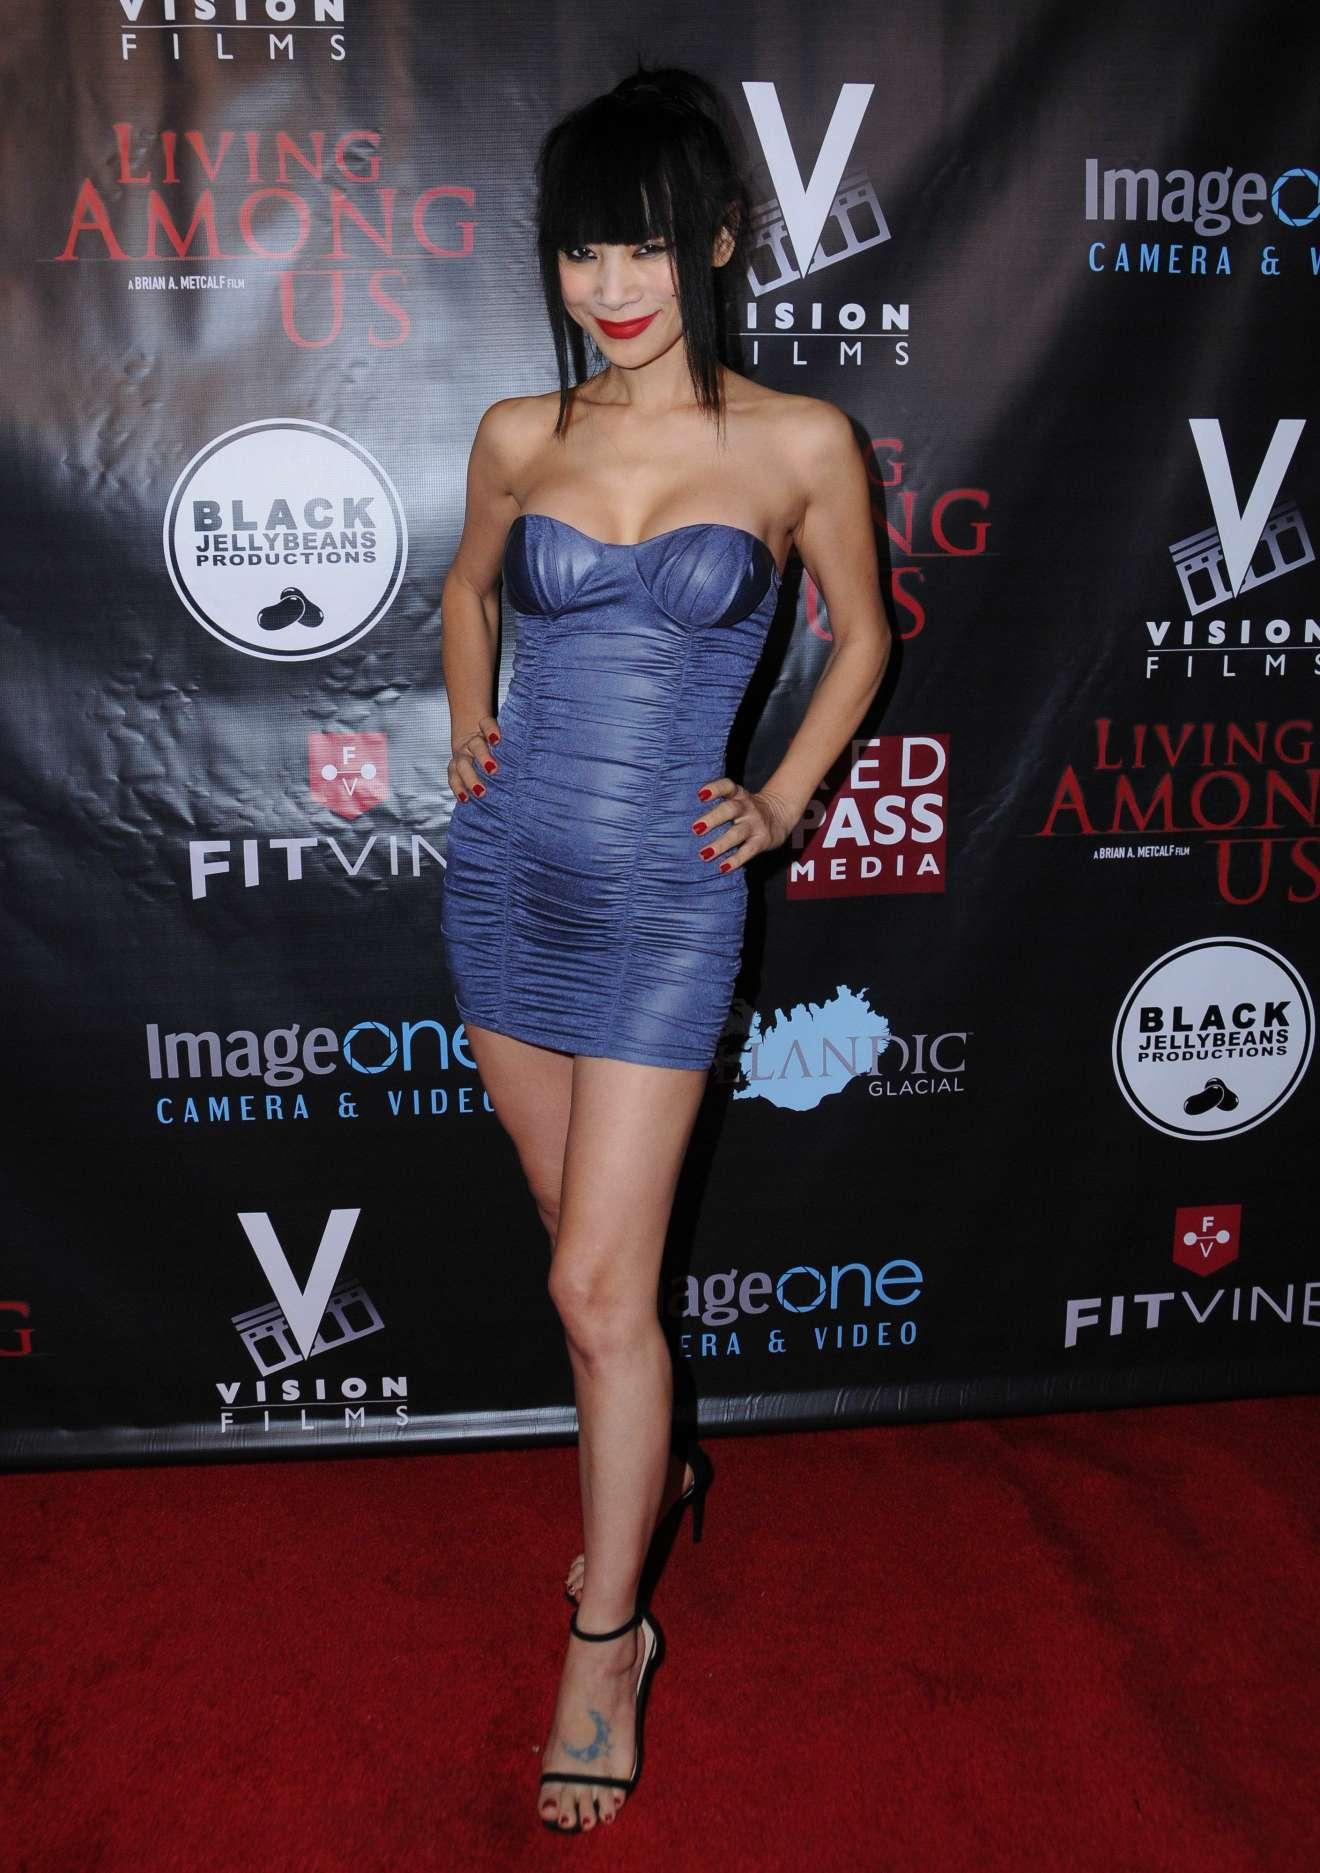 BethAnn Bonner Erotic clips Athena Karkanis,Jessica Heap